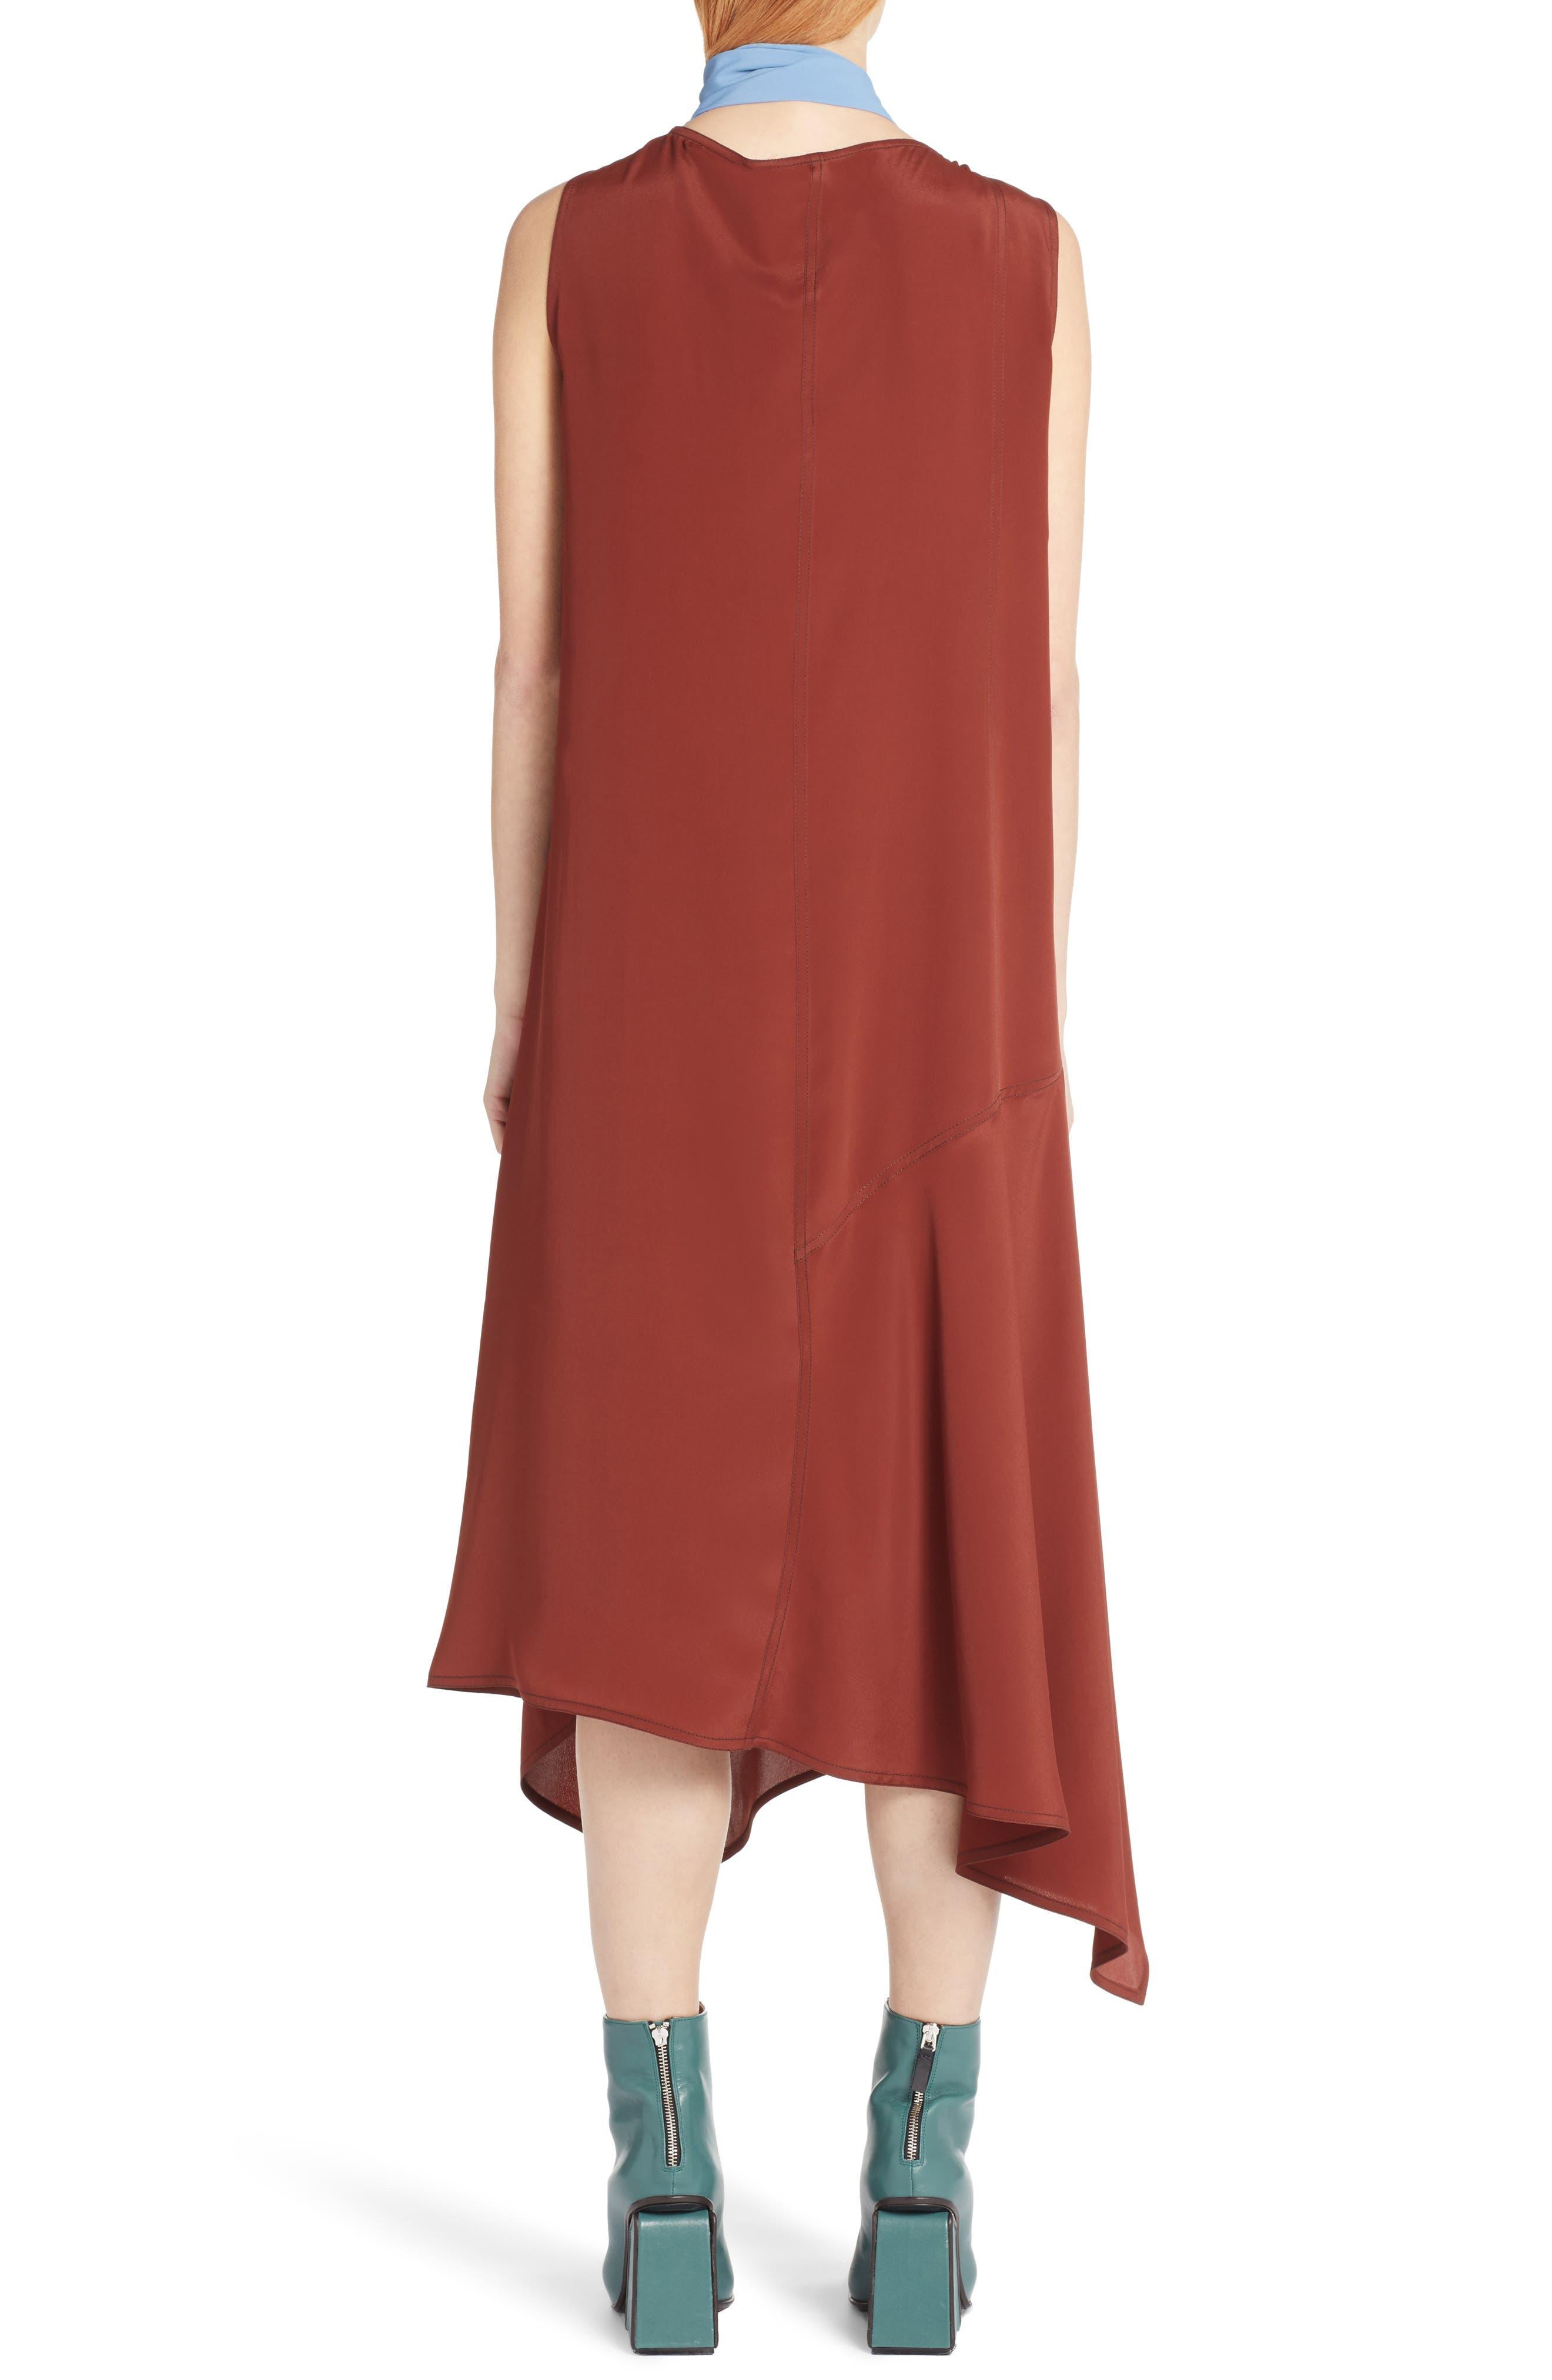 Tie Neck Side Button Dress,                             Alternate thumbnail 2, color,                             Port Red